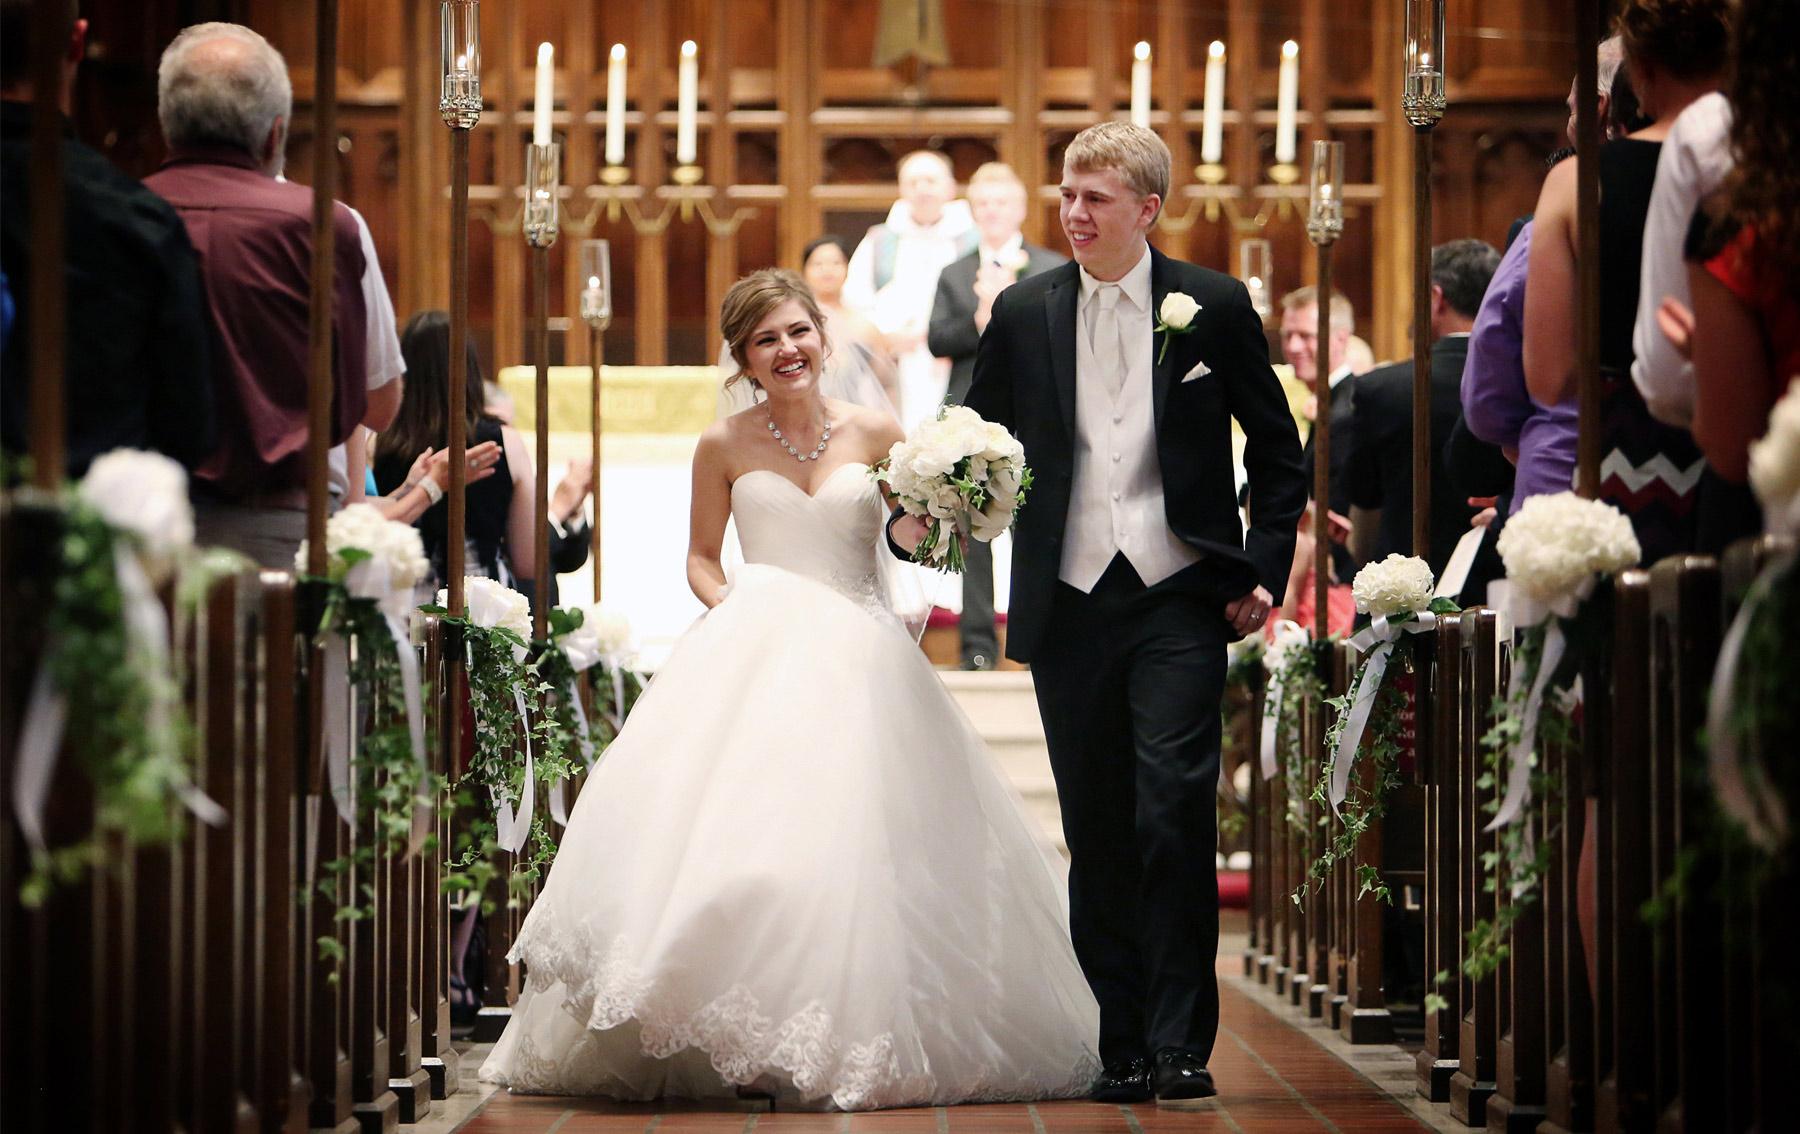 05-Minneapolis-Minnesota-Wedding-Photography-by-Vick-Photography-Central-Lutheran-Church-Ceremony-Courtney-&-John.jpg